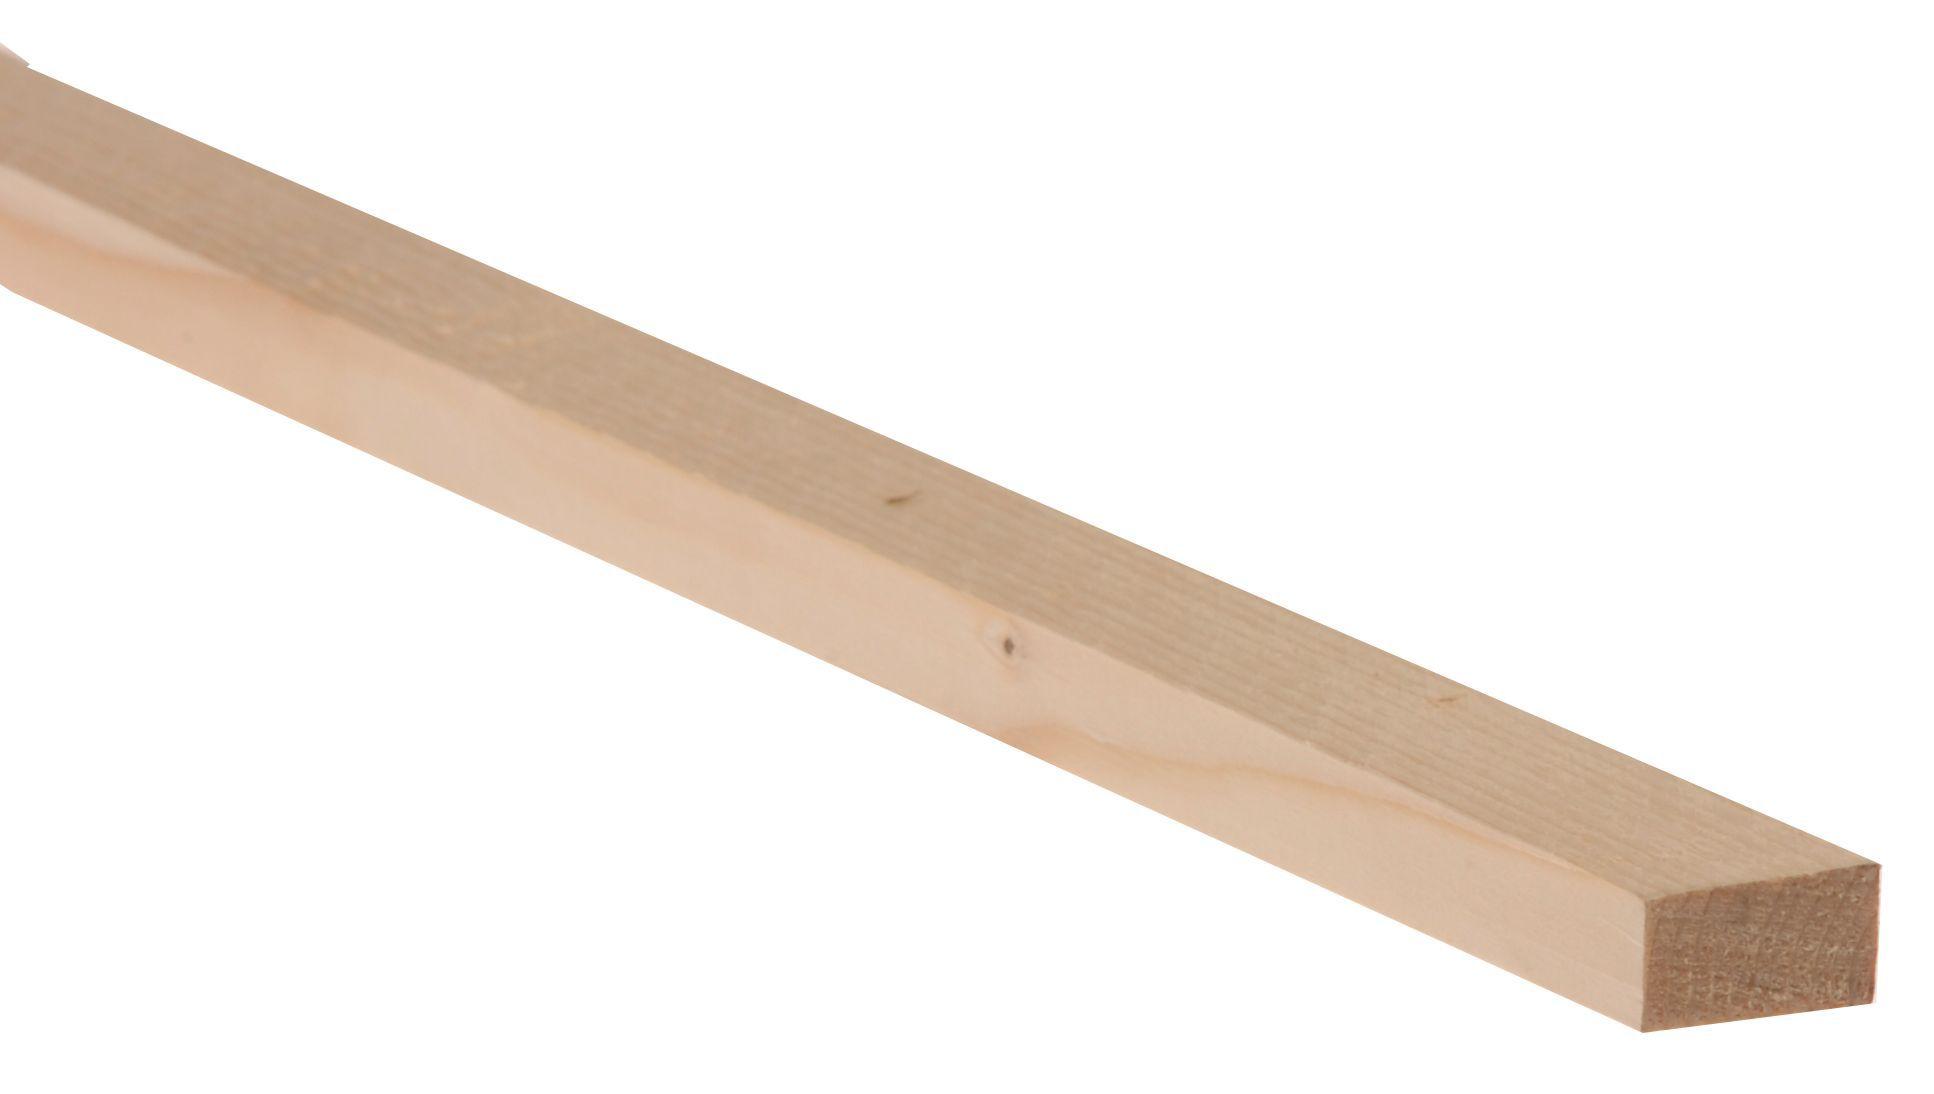 Cladding Timber Sheet Materials Building Supplies